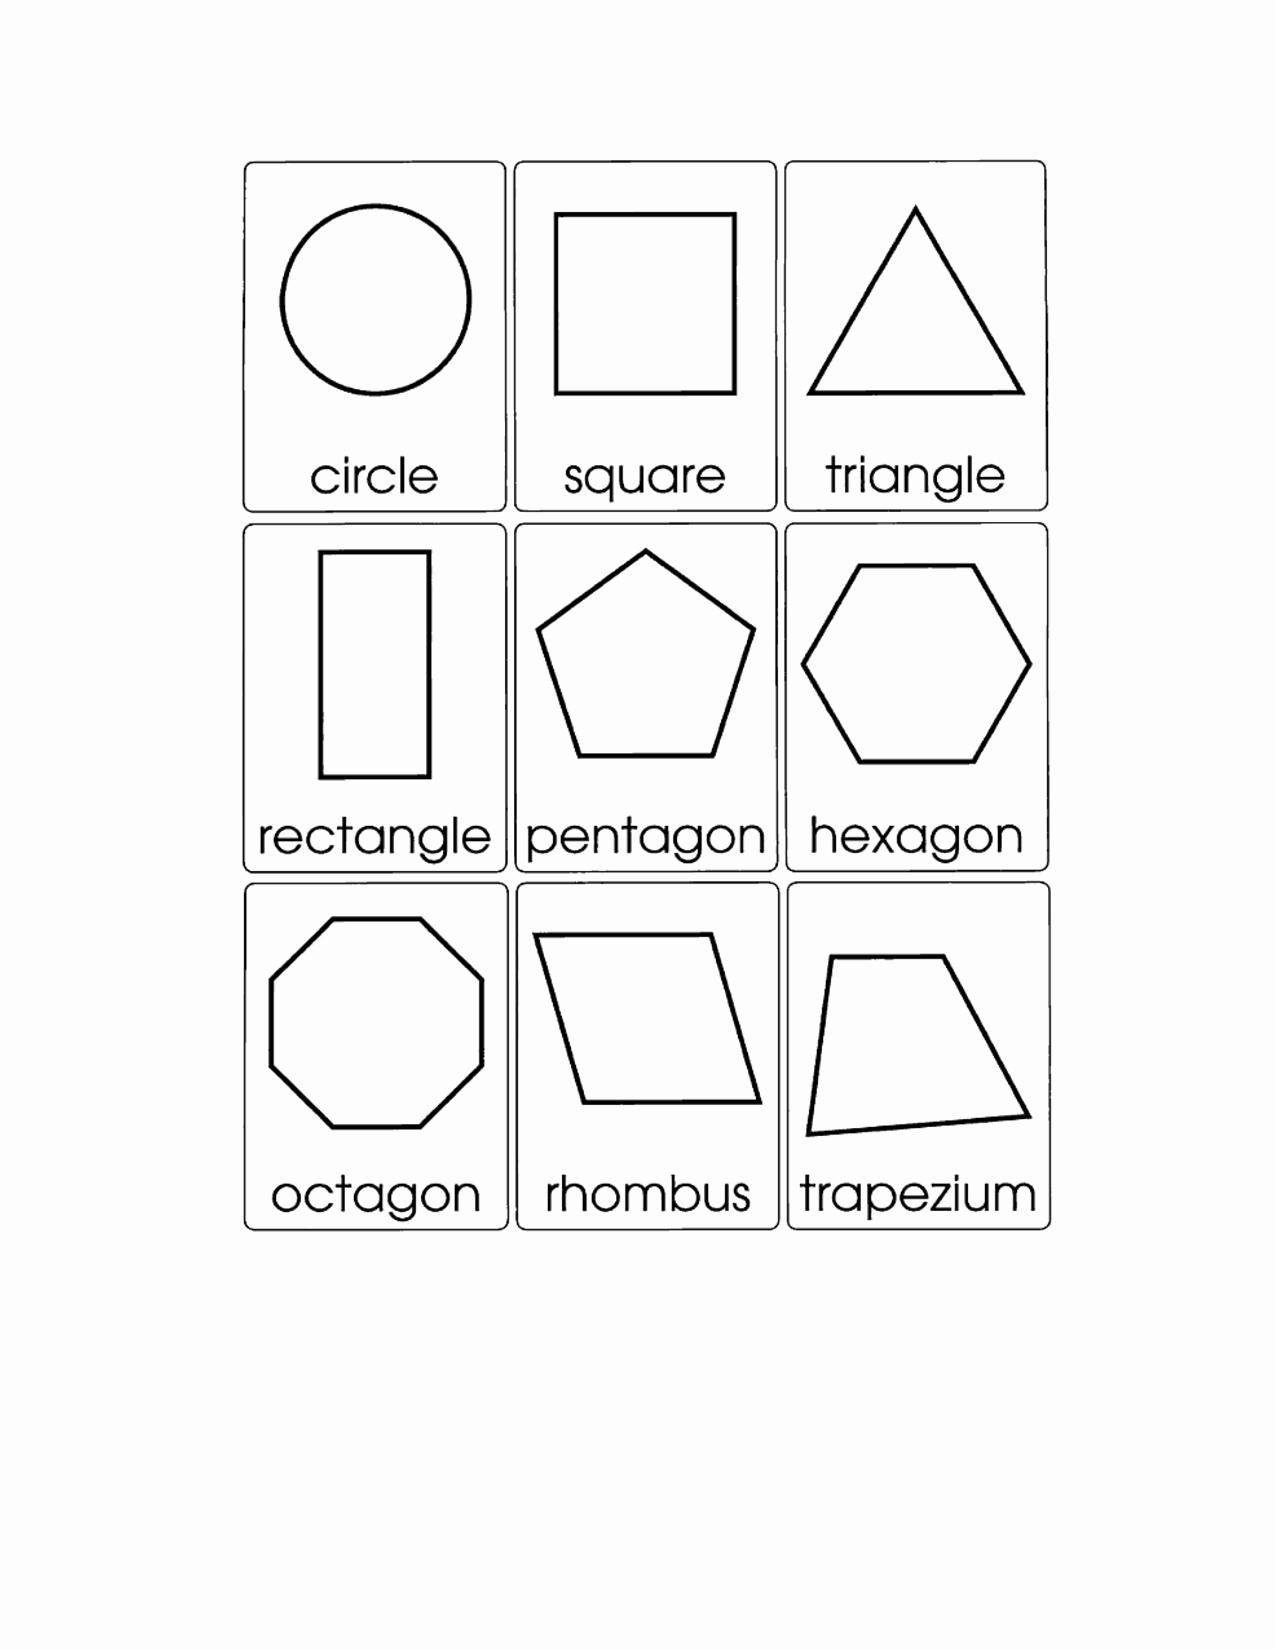 2d Shapes Worksheet Kindergarten Luxury 13 Best Of Printable Shape Matching Worksheets